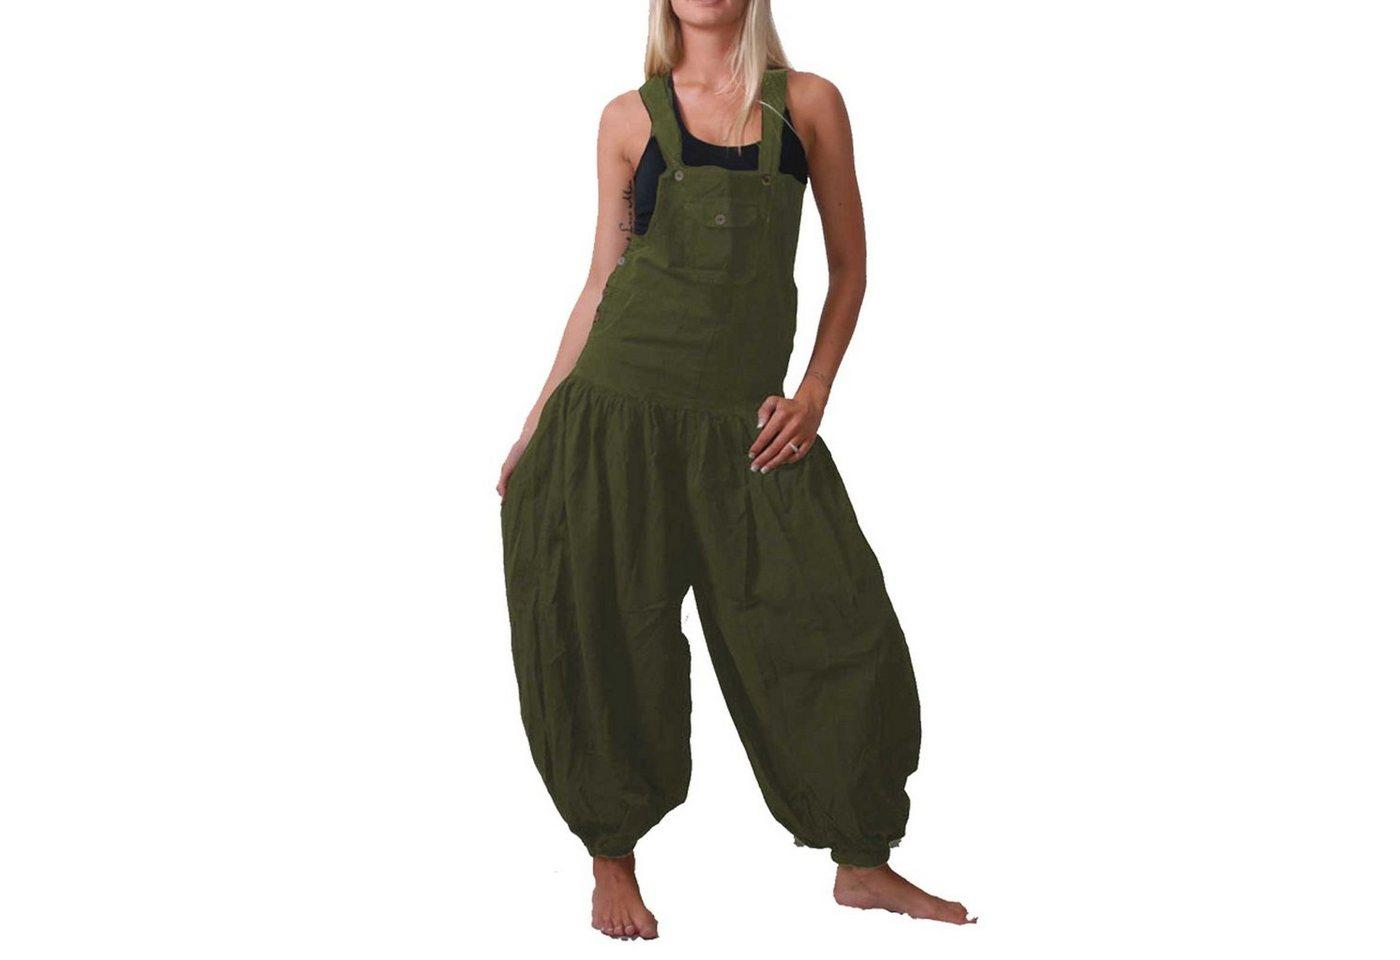 KUNST UND MAGIE Latzhose »Hippie Latzhose Haremshose Hose Psy Goa 70er Overall Boho«, grün